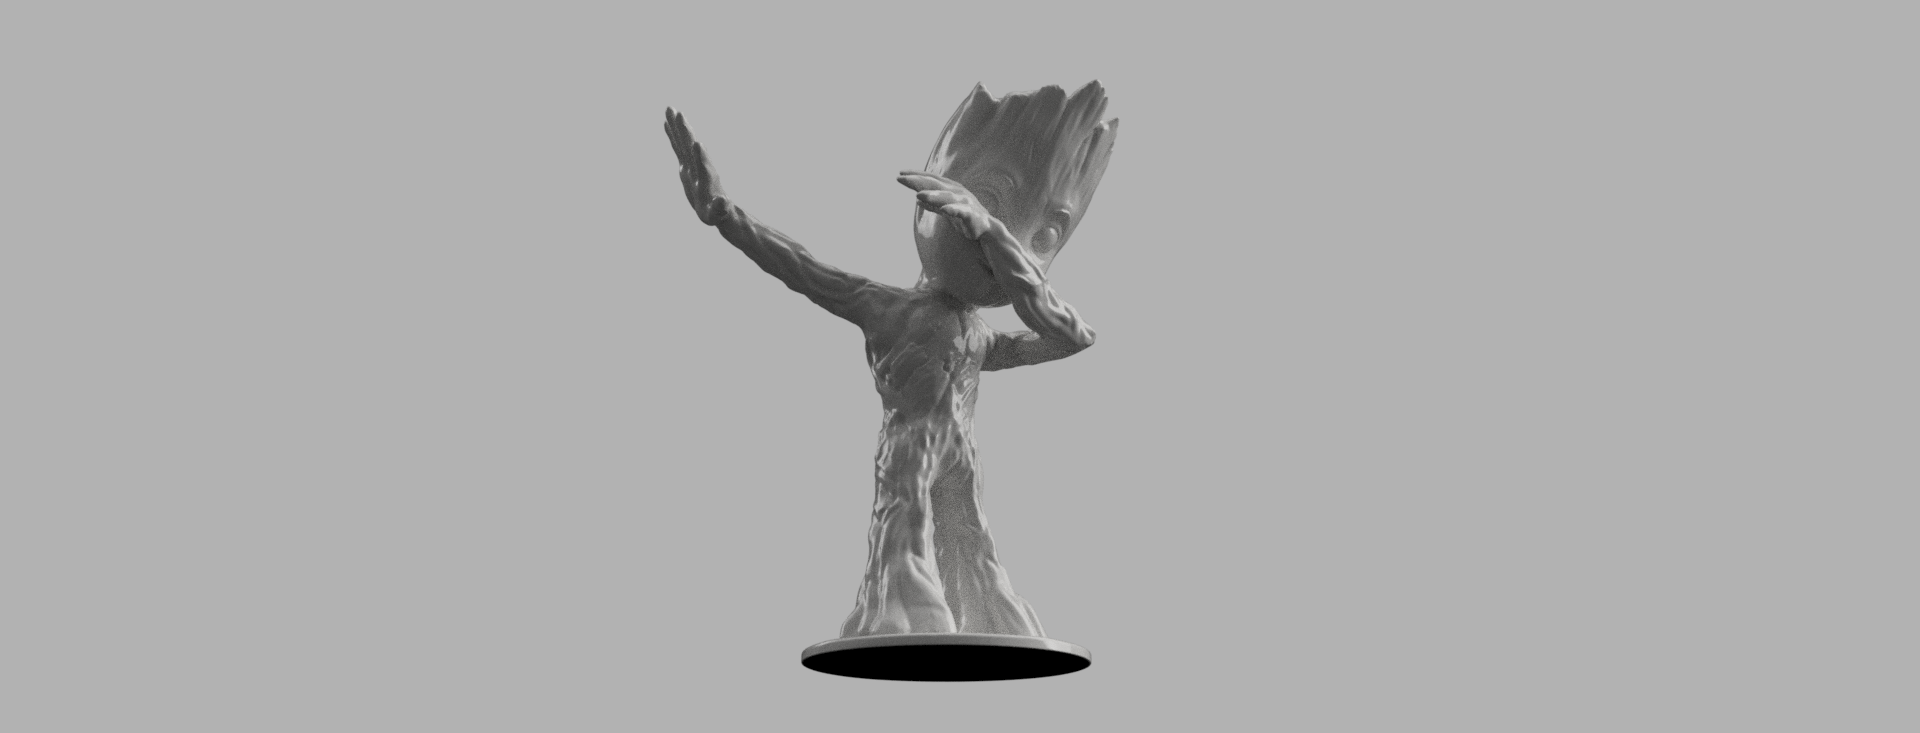 groot 2.png Download free STL file Baby Groot Dab • 3D printing template, Motek3D